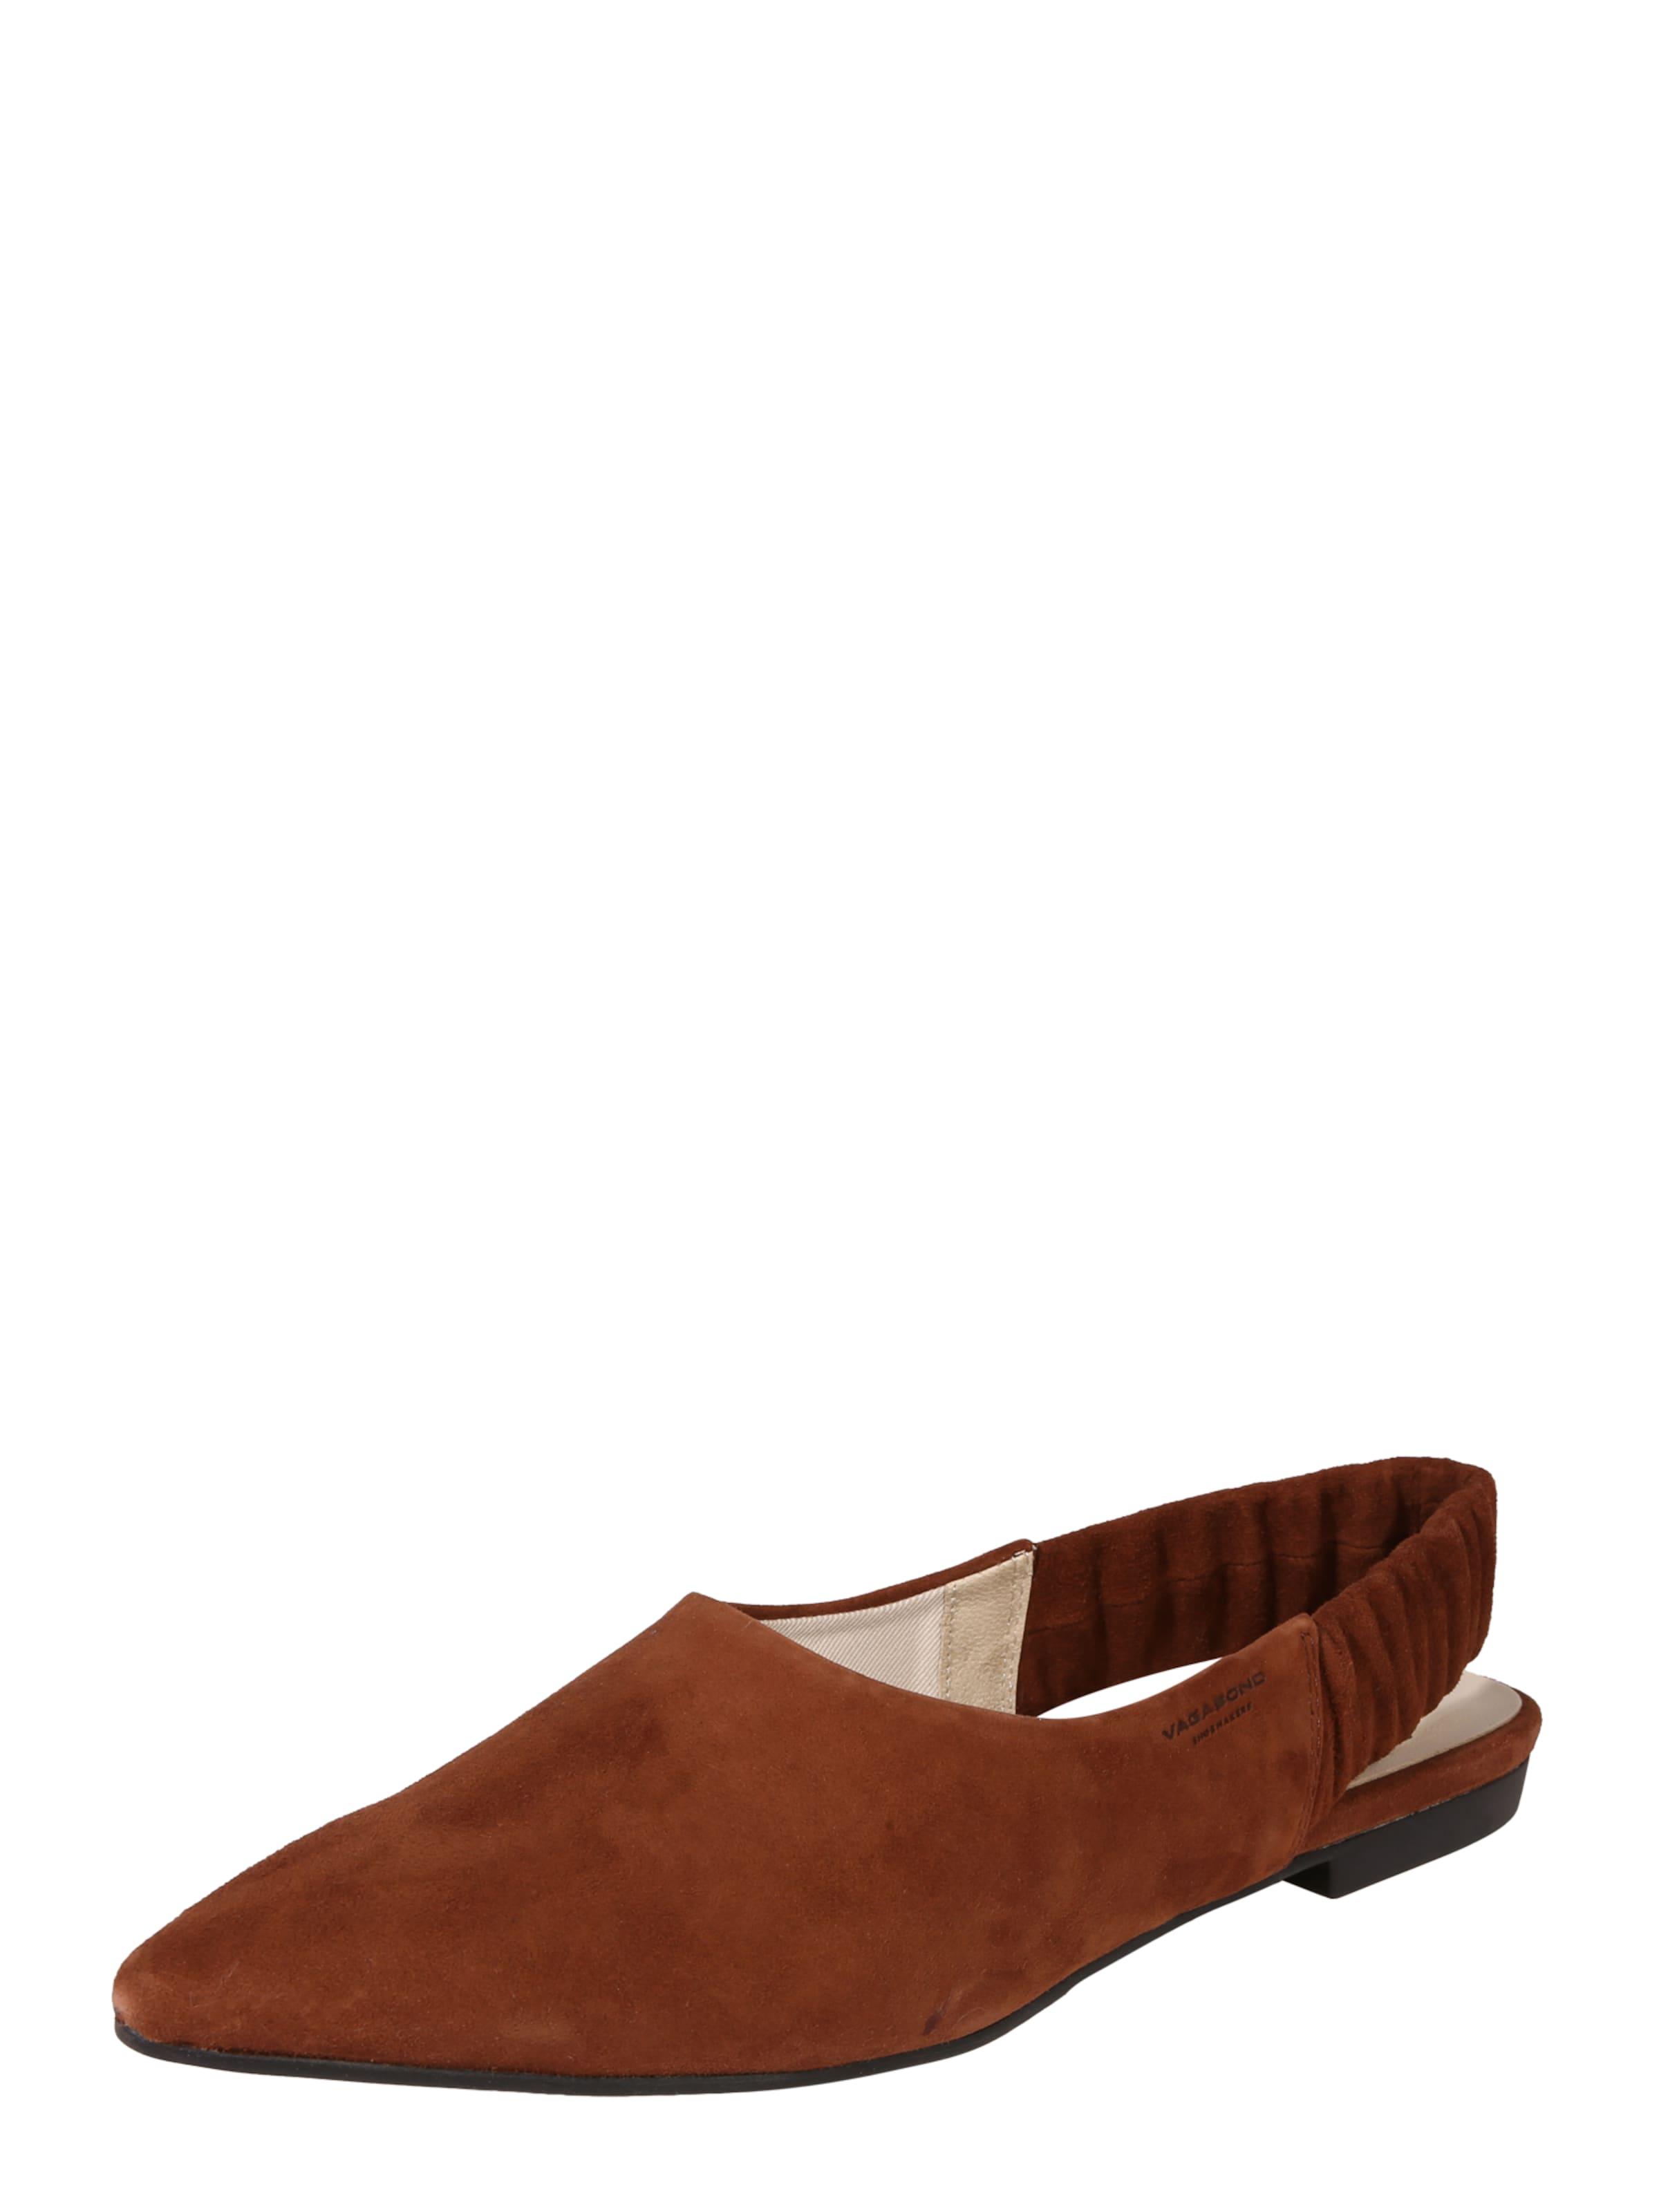 Vagabond Shoemakers Vagabond Shoemakers Slingpumps In Shoemakers Vagabond Slingpumps Rostbraun Slingpumps In Rostbraun c34LqS5ARj